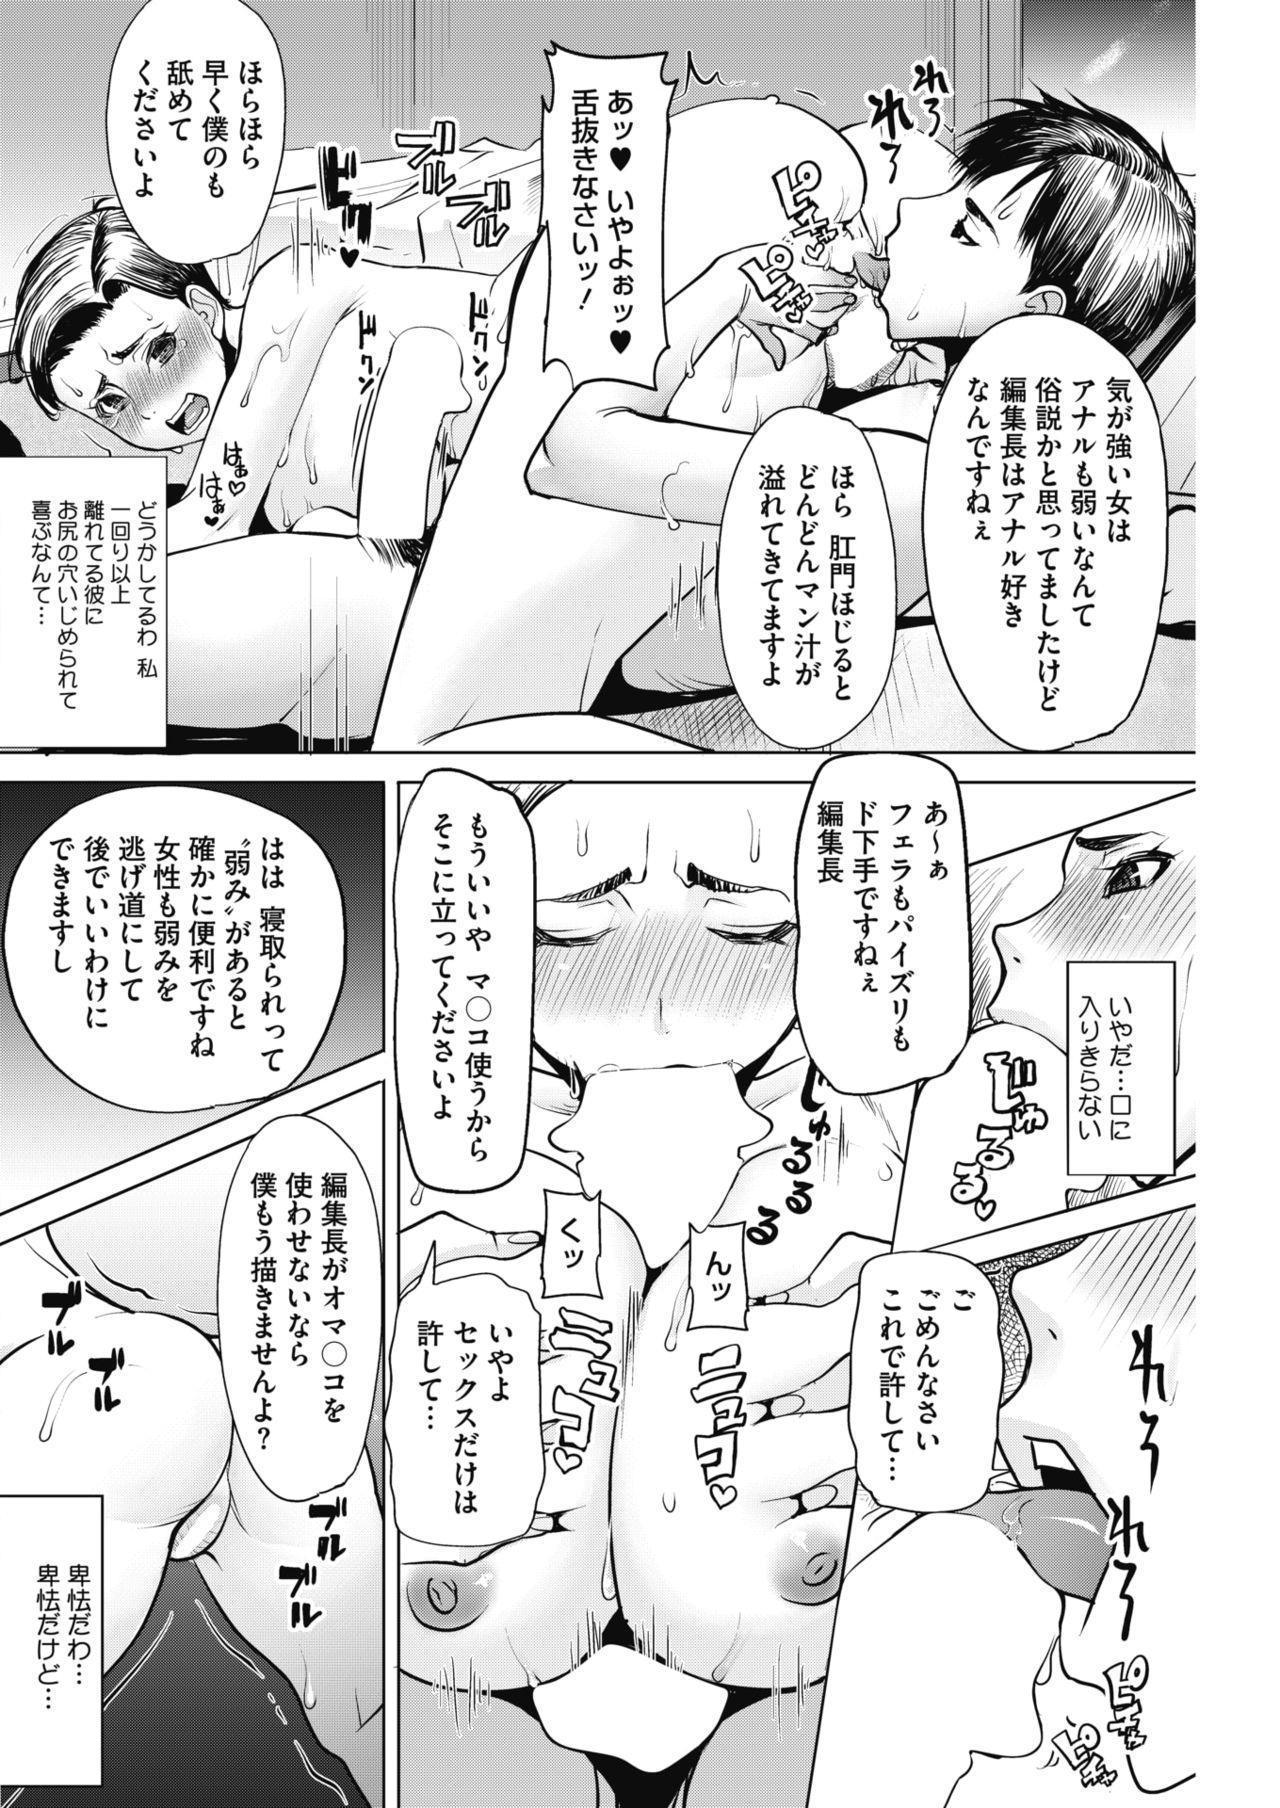 COMIC HOTMiLK Koime Vol. 17 132